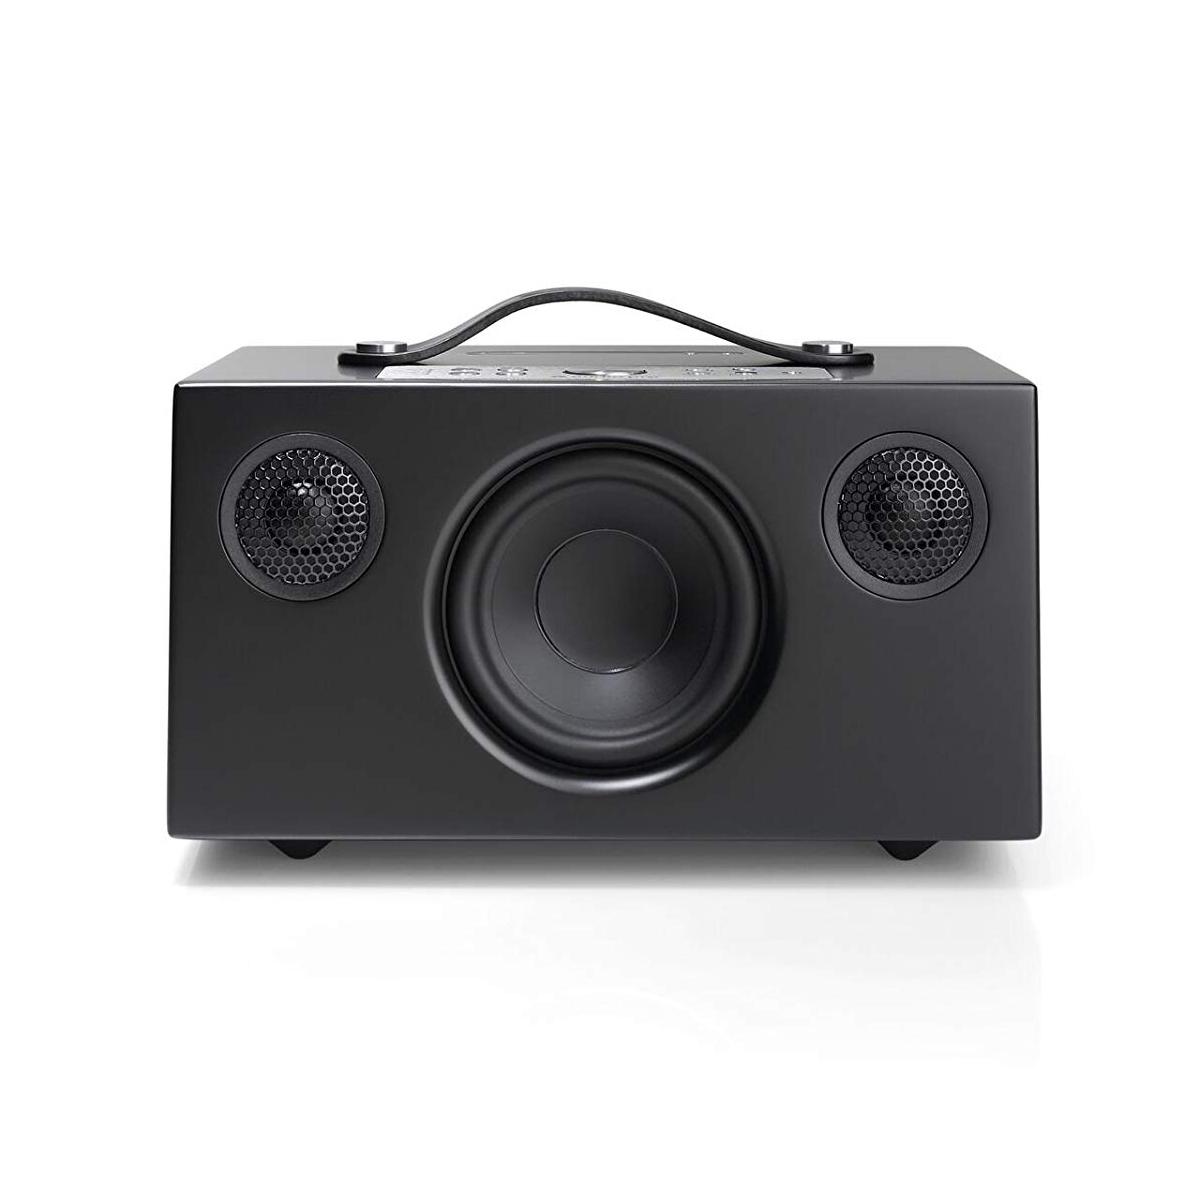 Image of Audio Pro Addon C5A Wireless Multiroom Smart Speaker with Alexa in Black